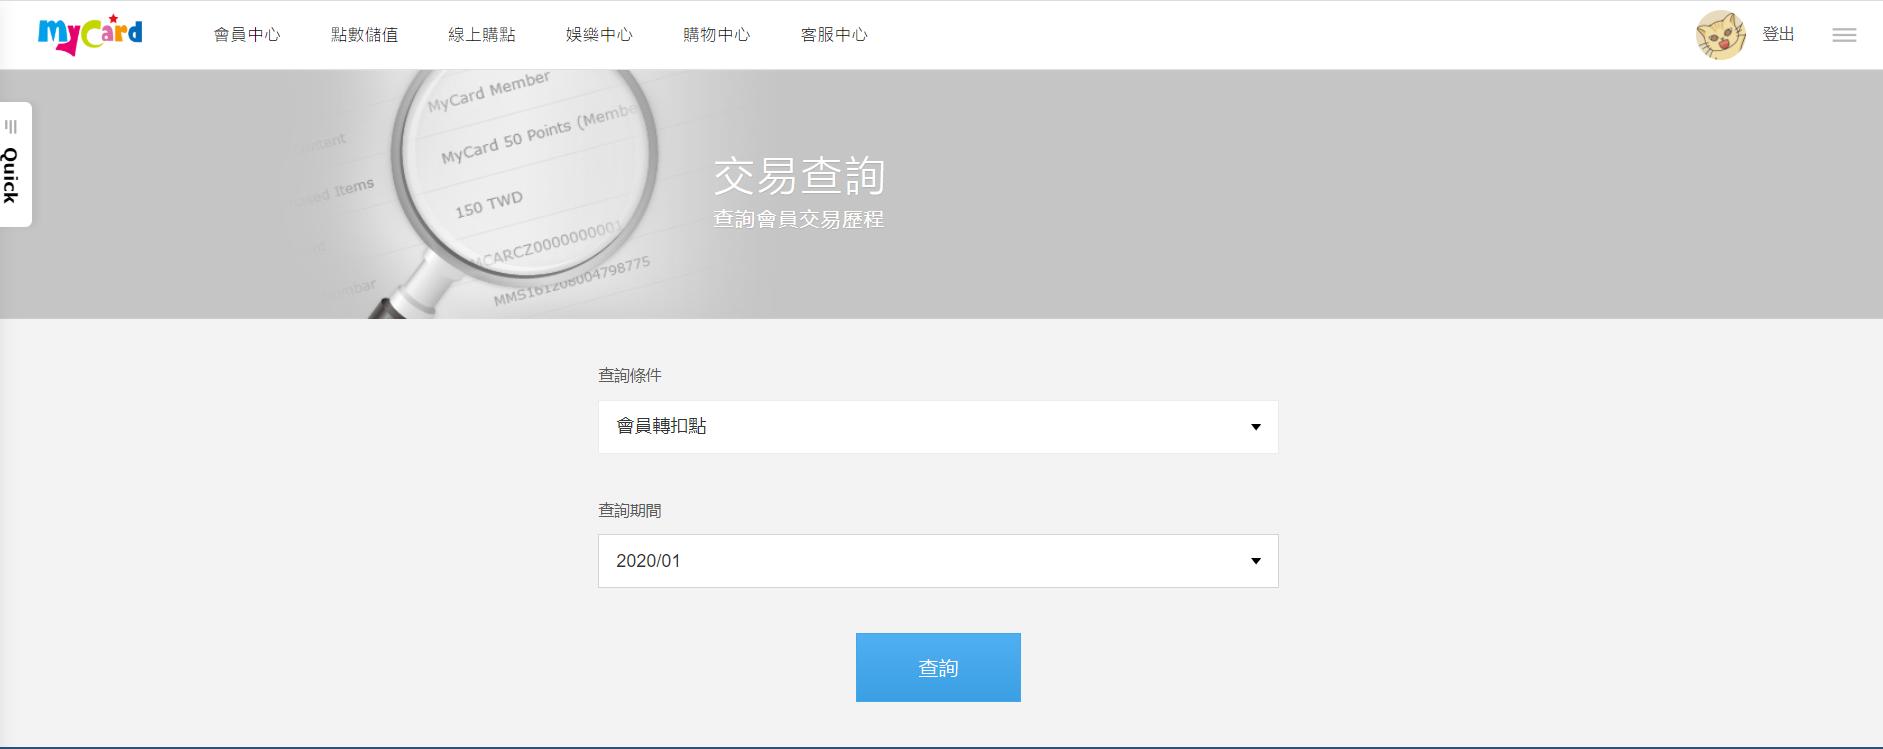 Mycard储值活动详细流程指南-会员转扣点.png